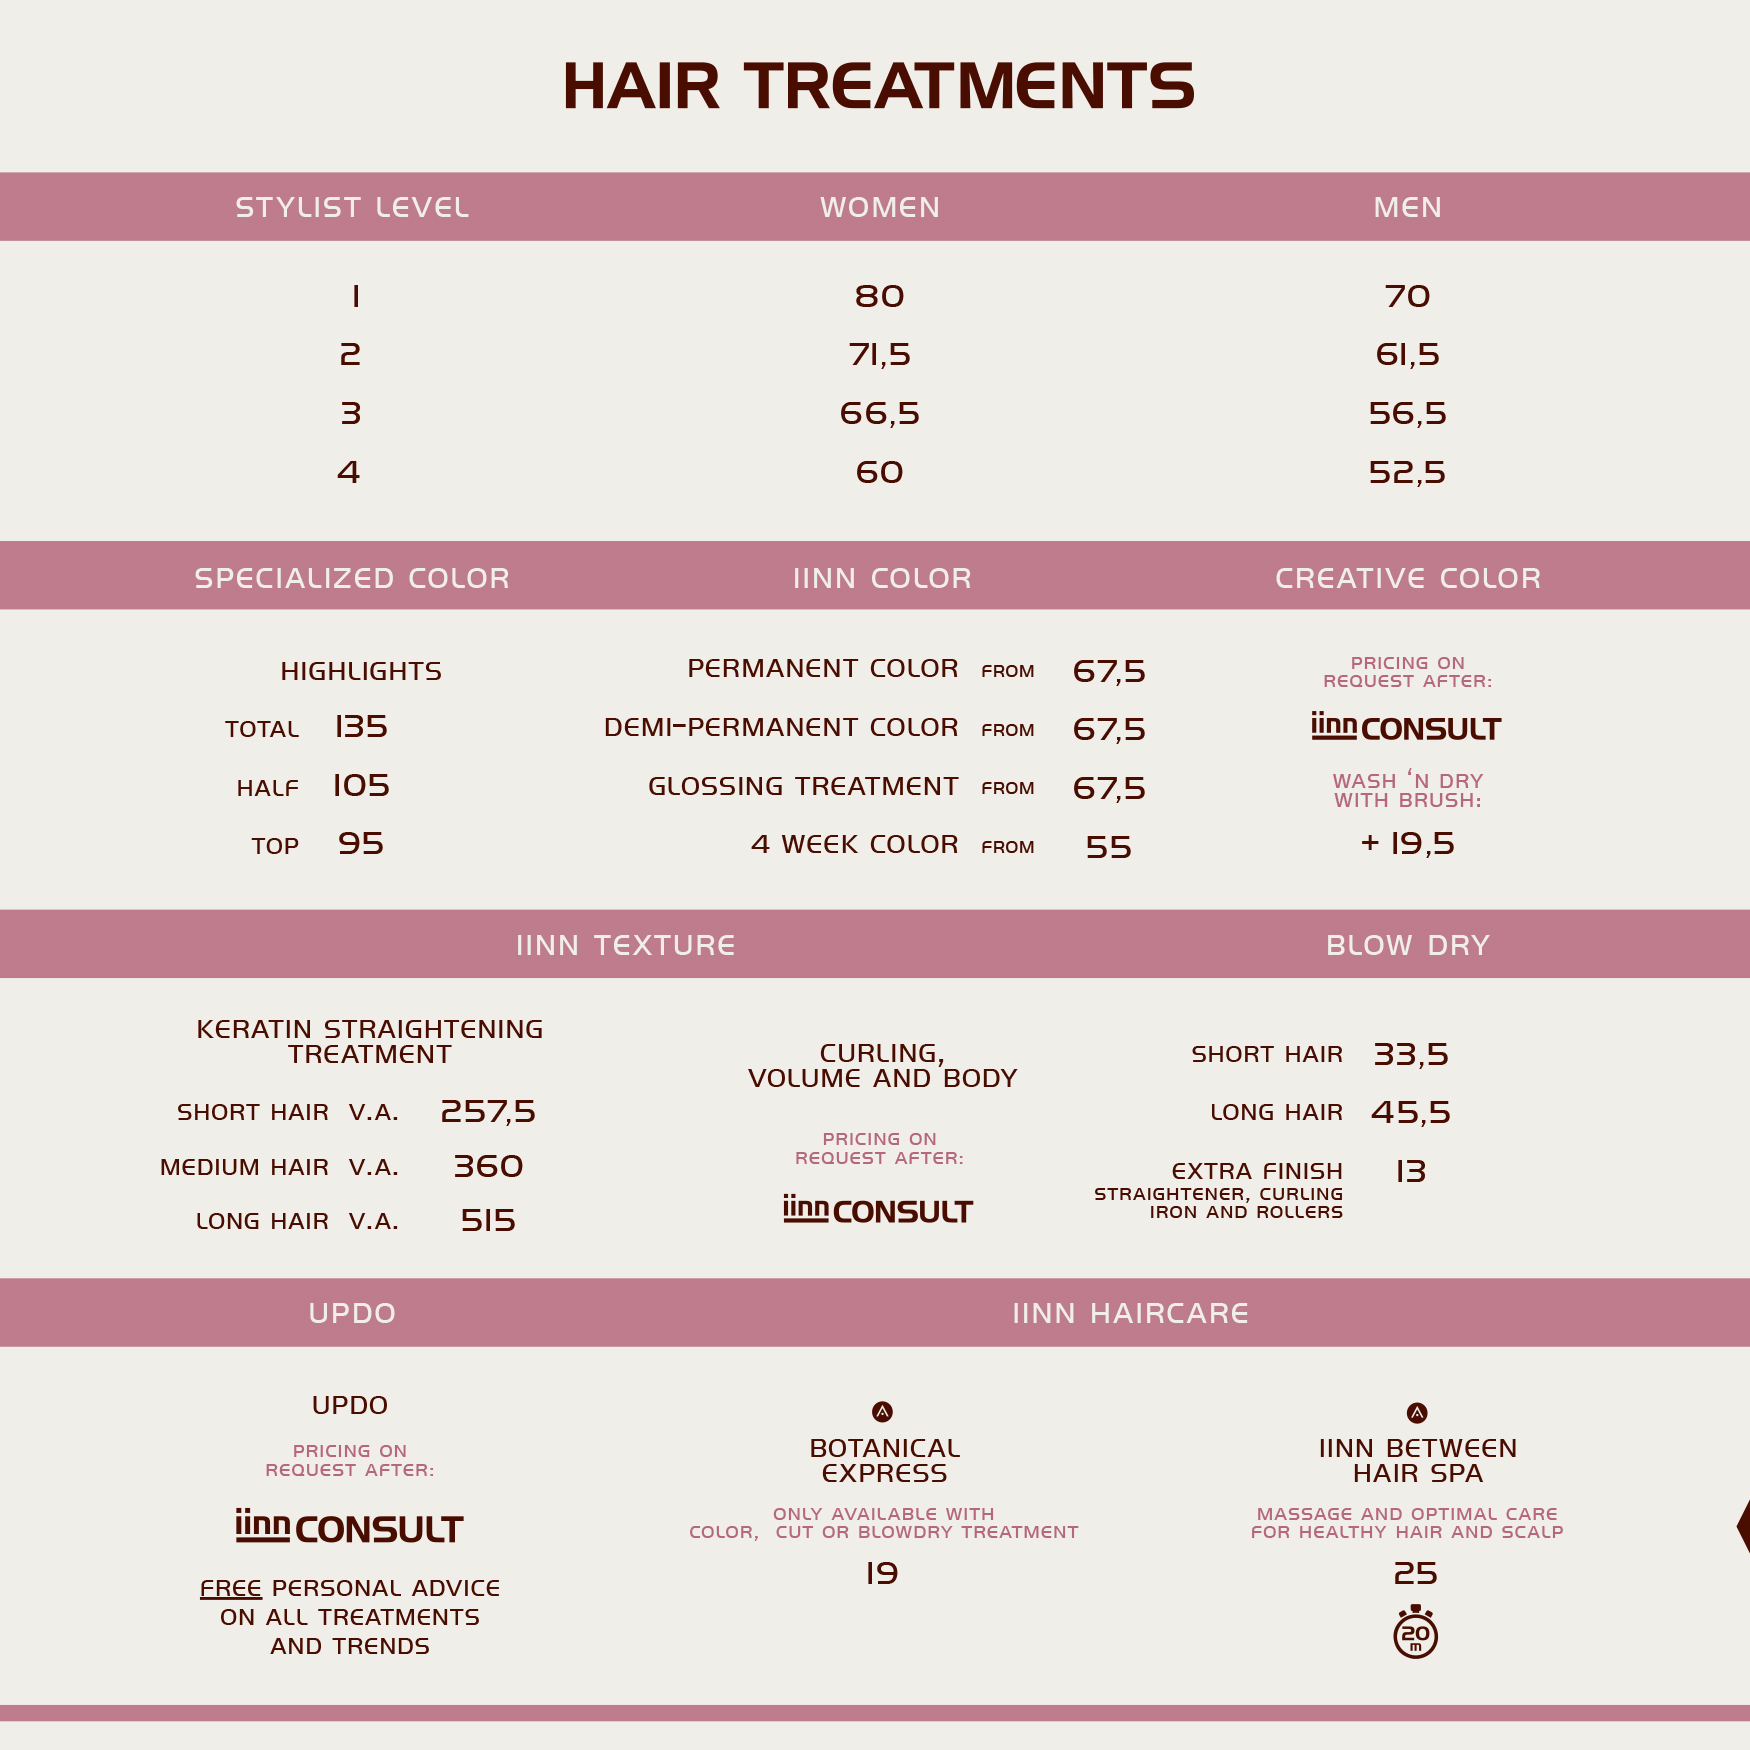 iinn - sustainable beauty - hair treatments